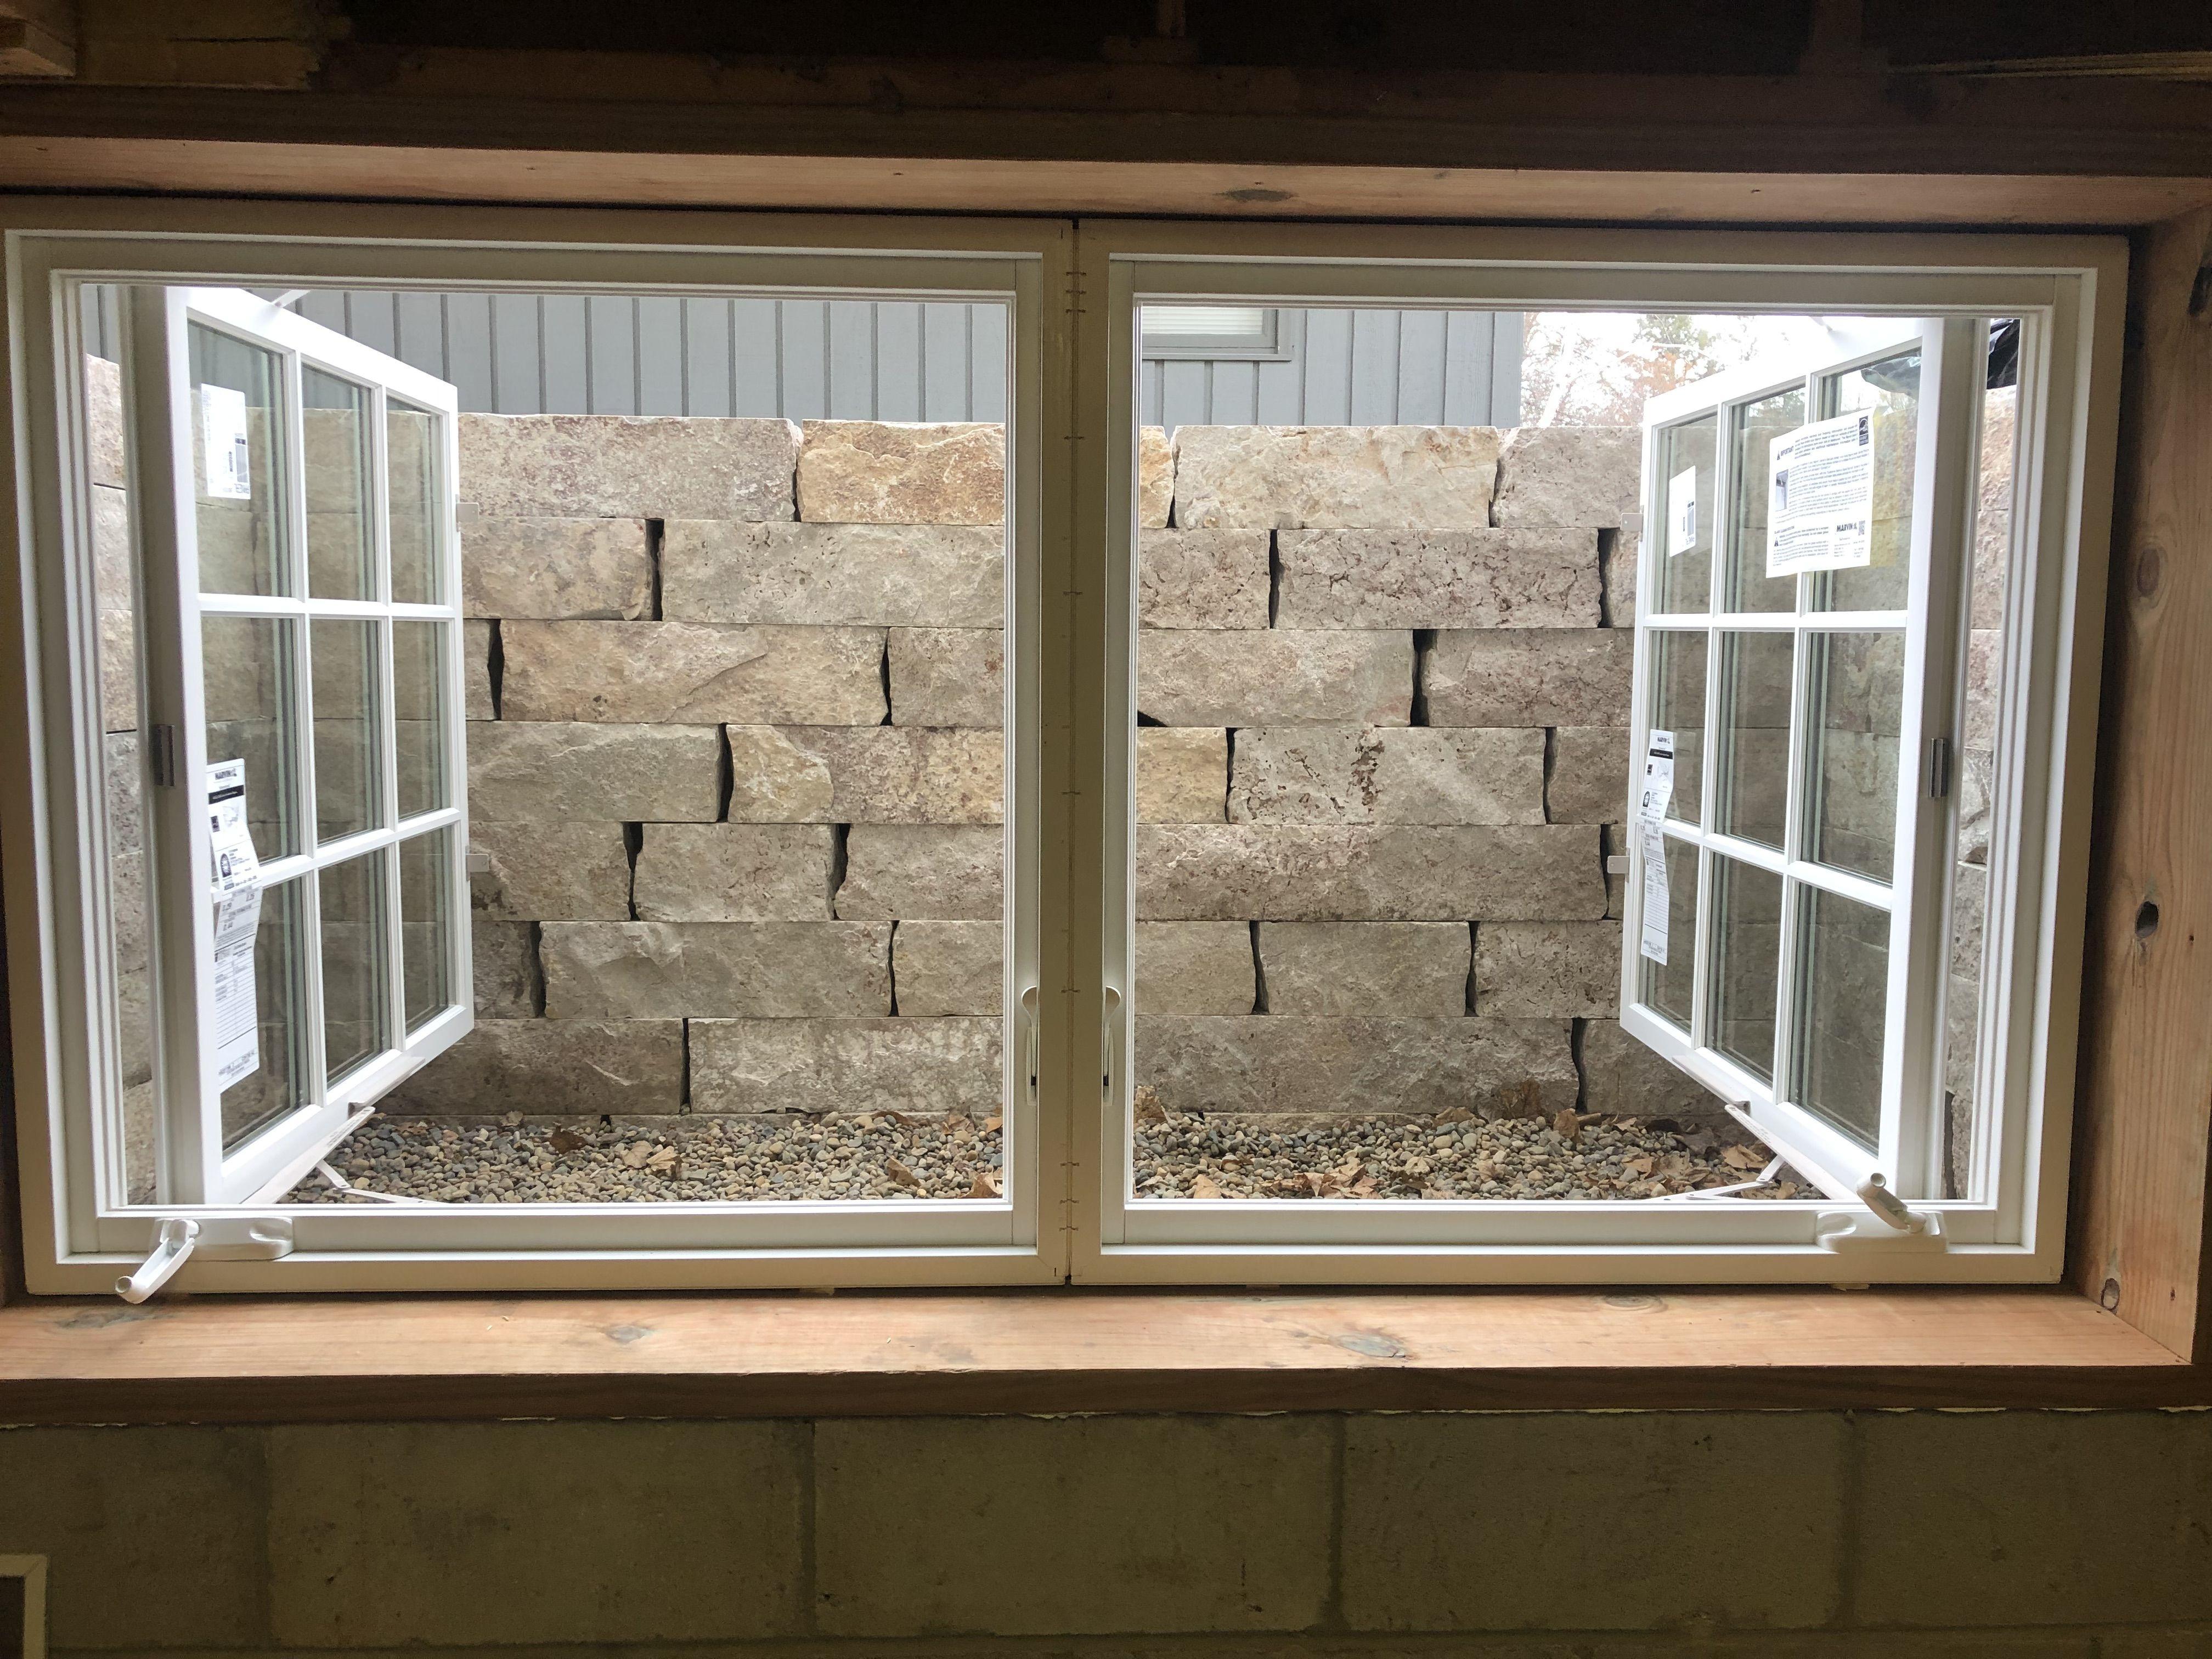 Natural Stone Egress Window Well Egress Window Egress Window Well Double Casement Windows